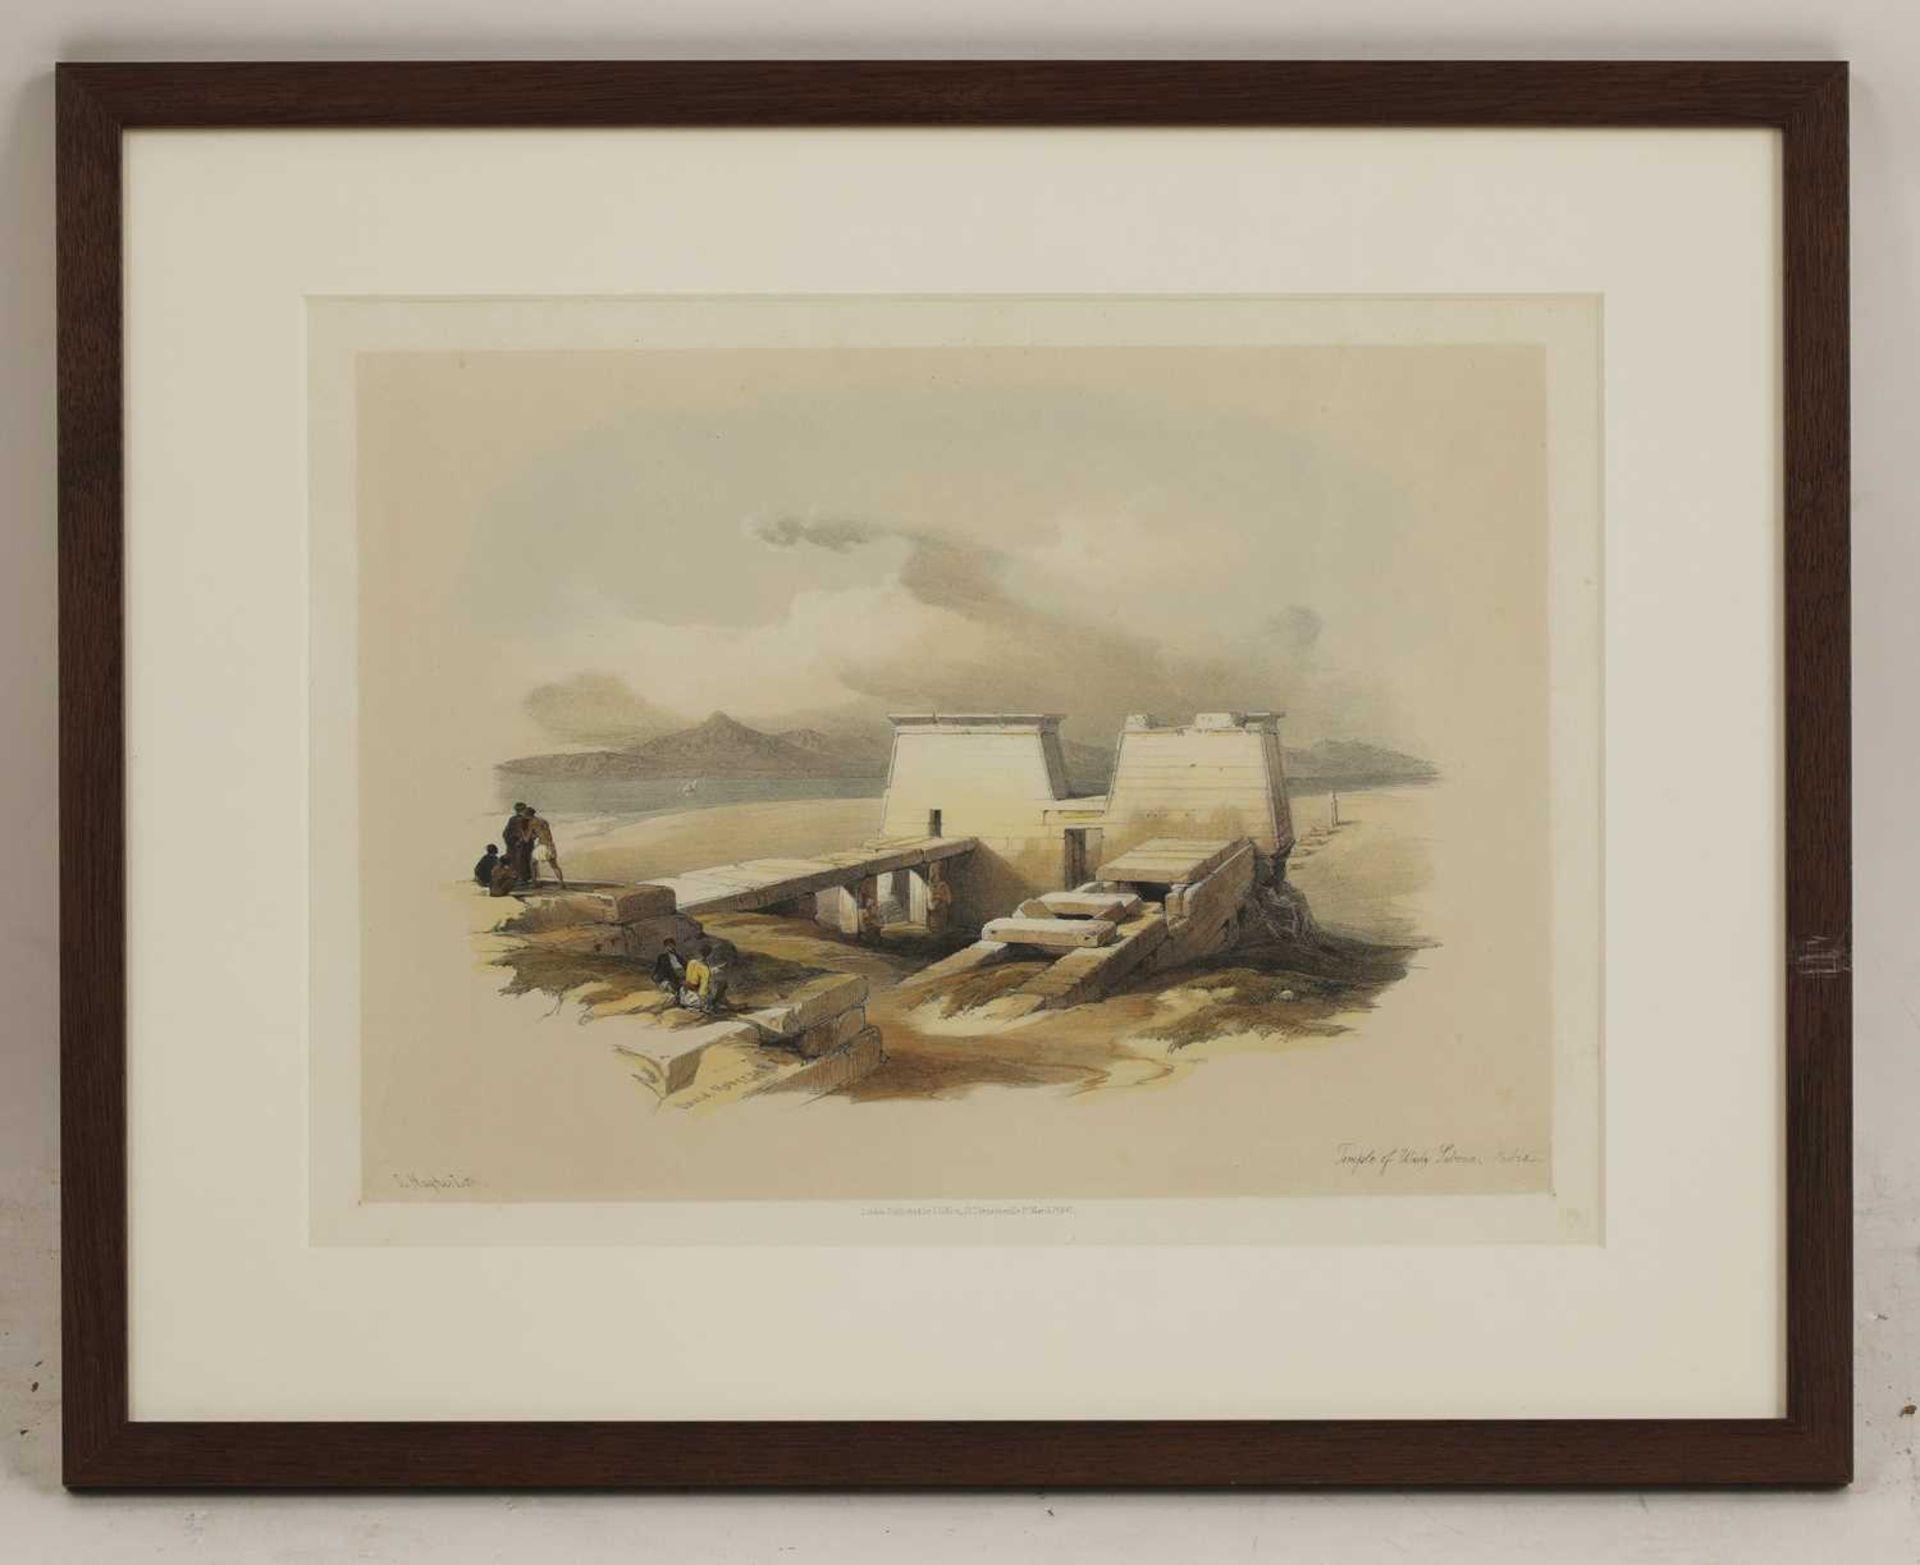 Louis Haghe after David Roberts RA (1796-1864) - Image 4 of 20